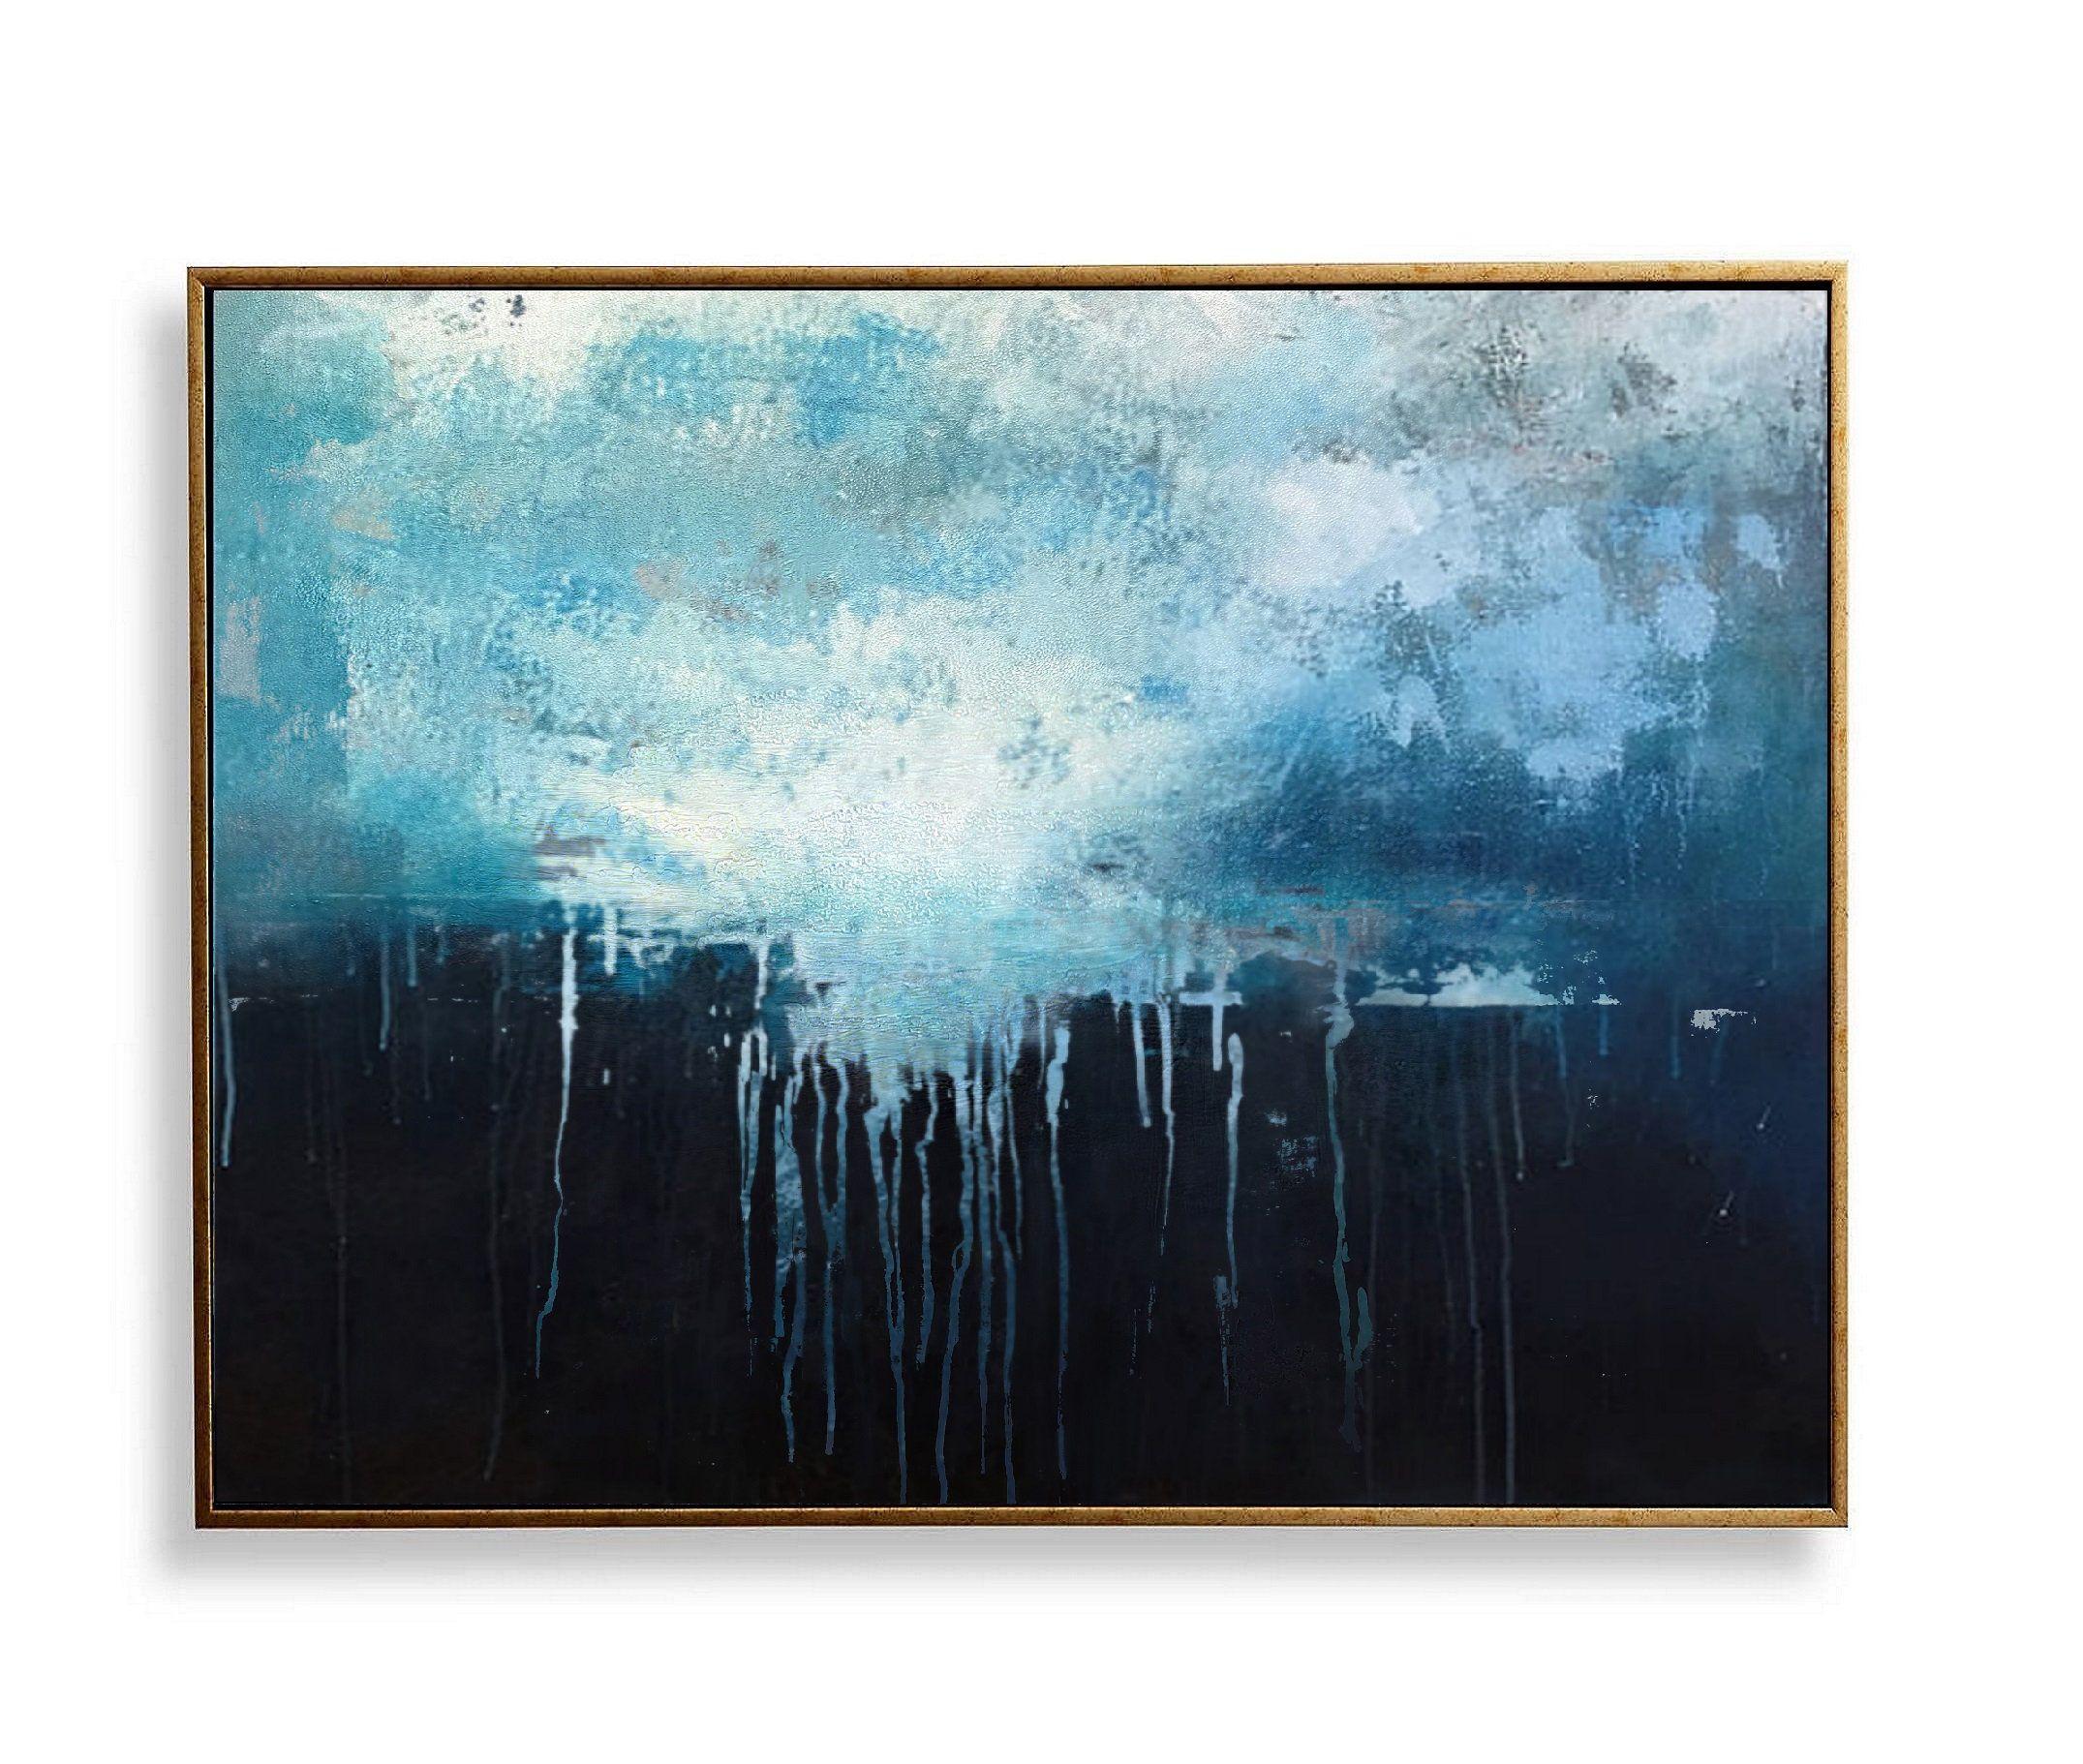 Large Dark Blue Abstract Art Sky Landscape Oil Paintingblack Etsy Oil Painting Abstract Blue Abstract Art Art Painting Oil